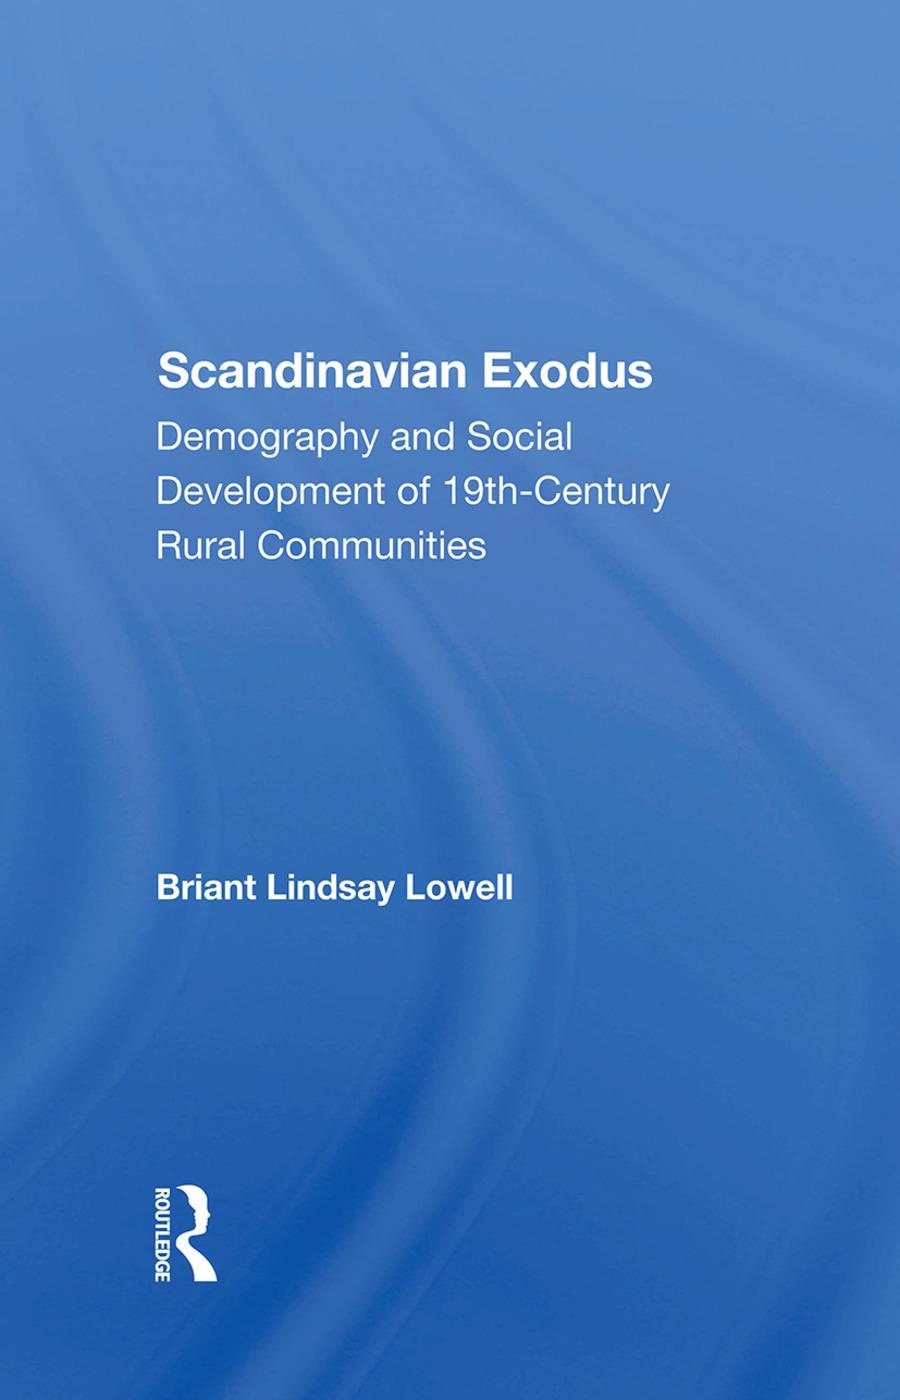 Scandinavian Exodus: Demography And Social Development Of 19th Century Rural Communities, 1st Edition (Hardback) book cover